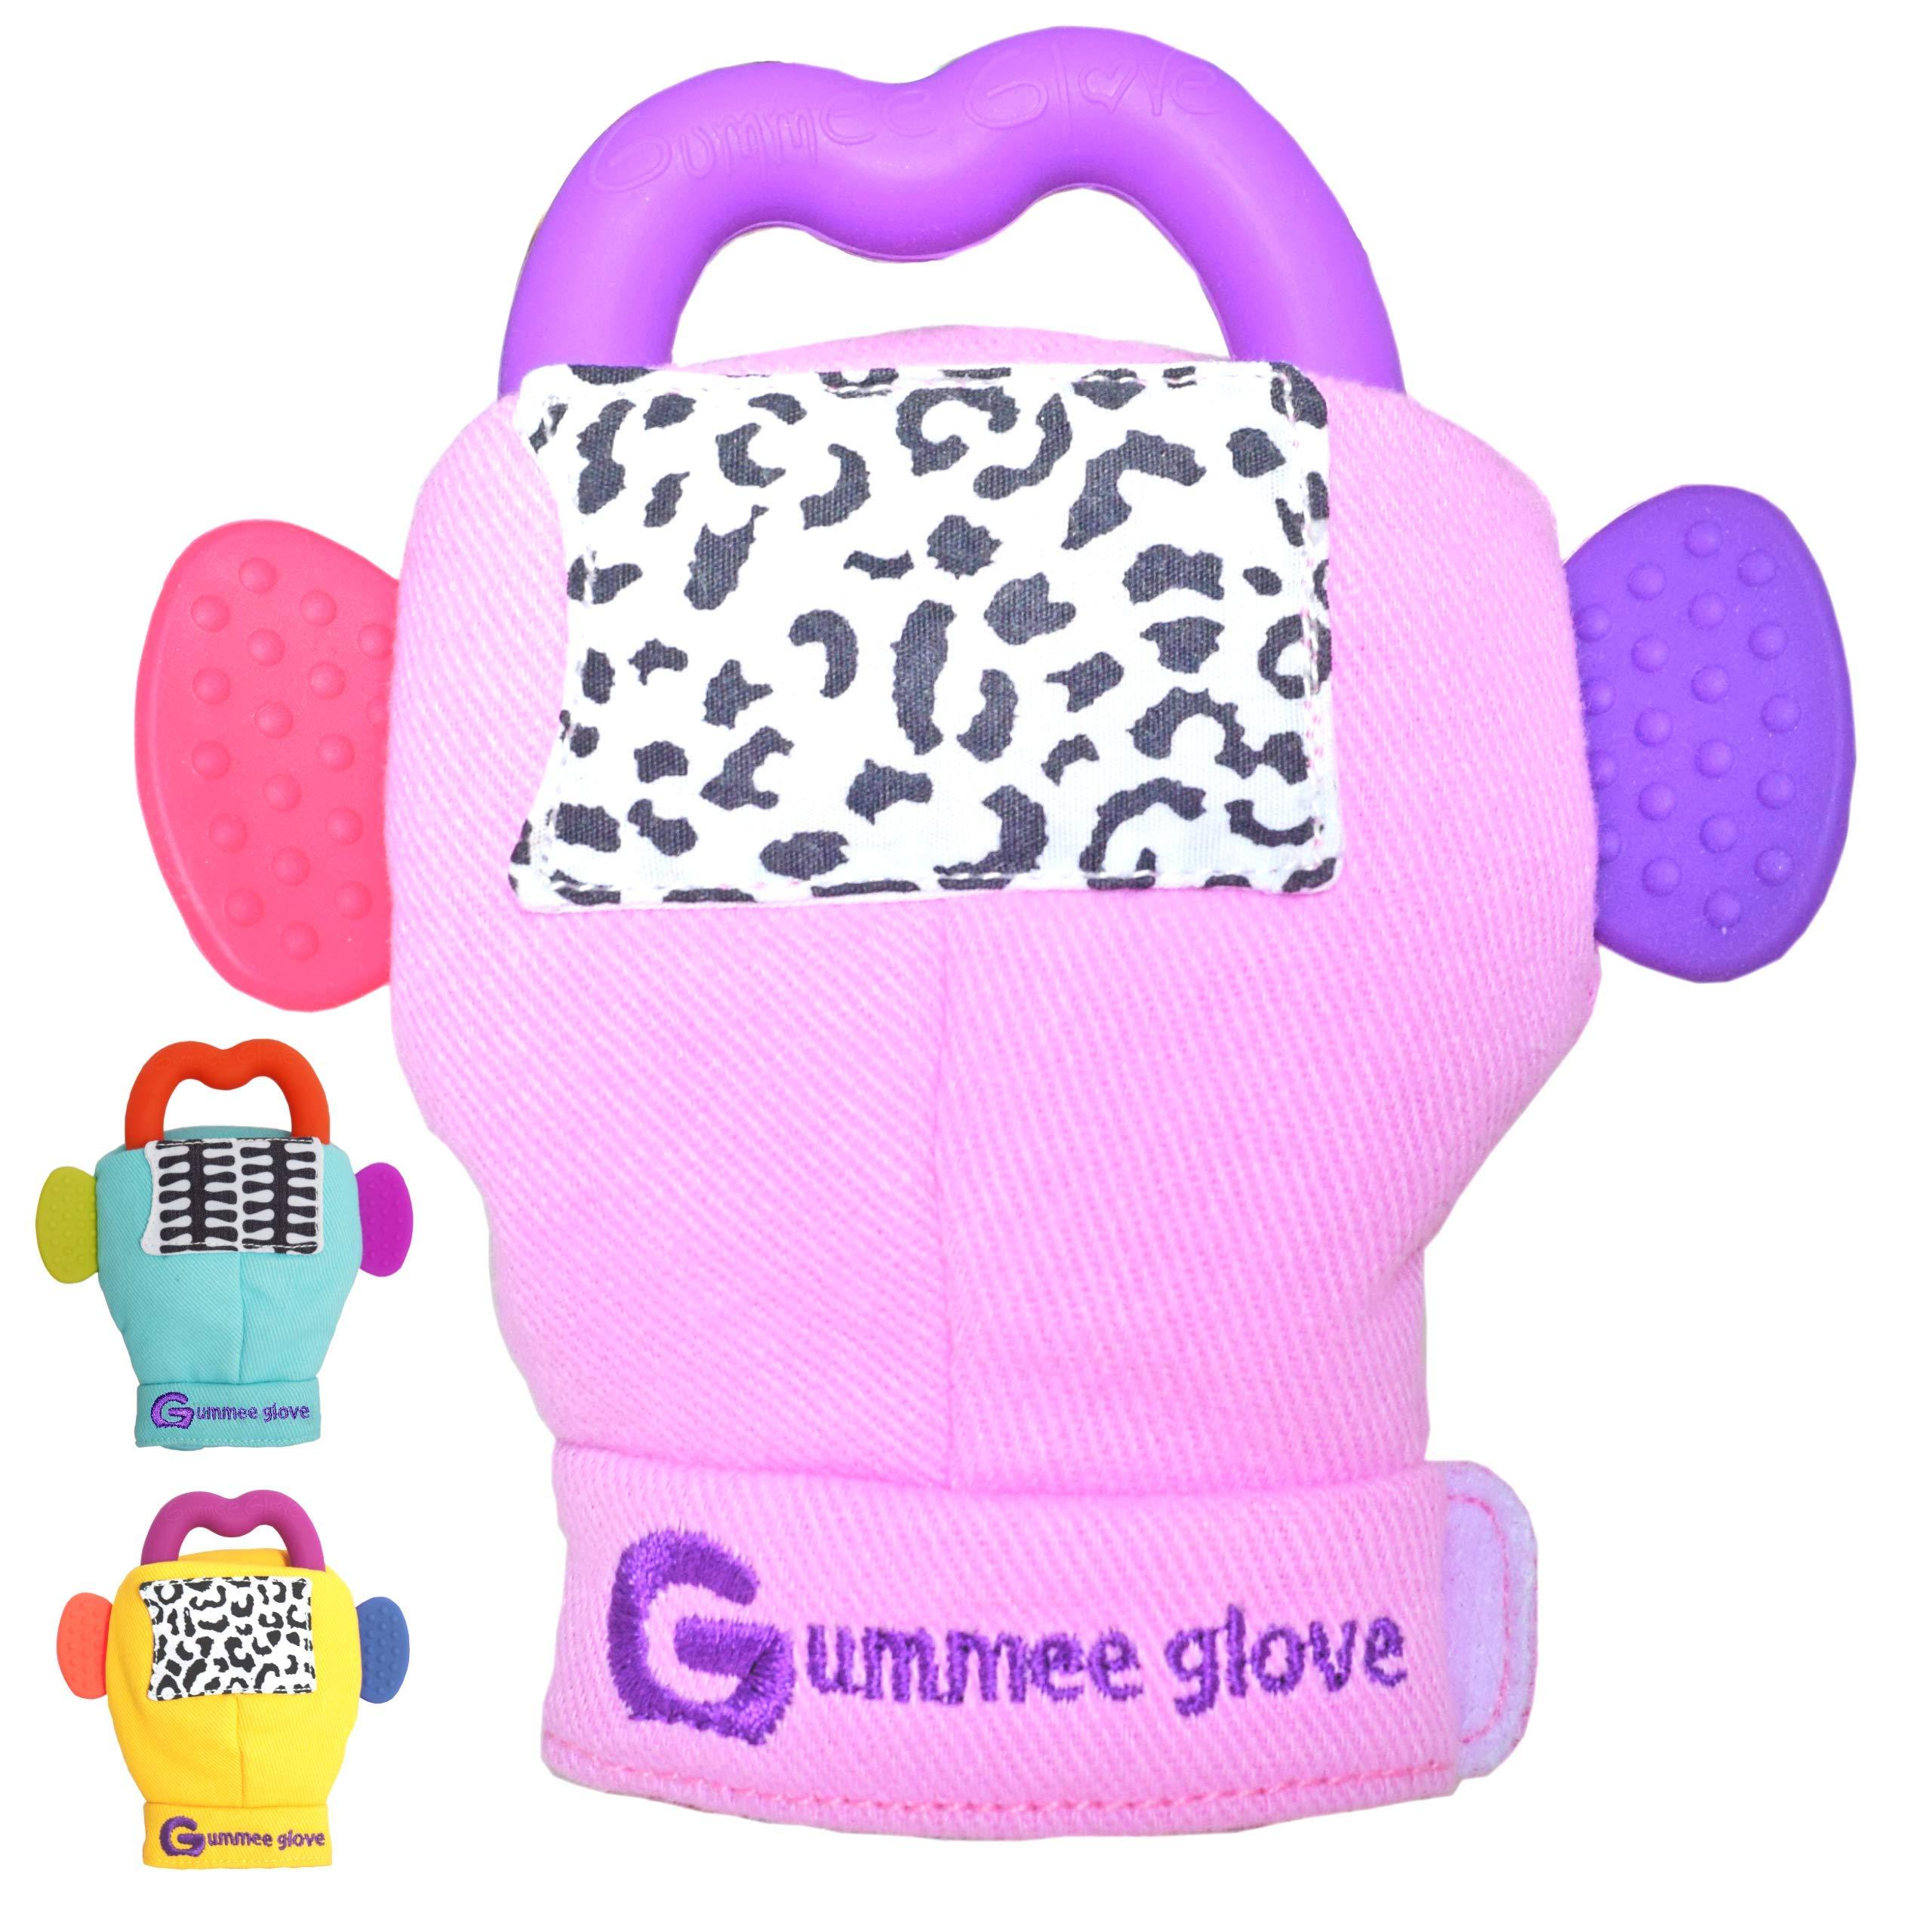 Pink Original Gummee Glove Baby Teething Mitten Toy /& Ring 3 Months